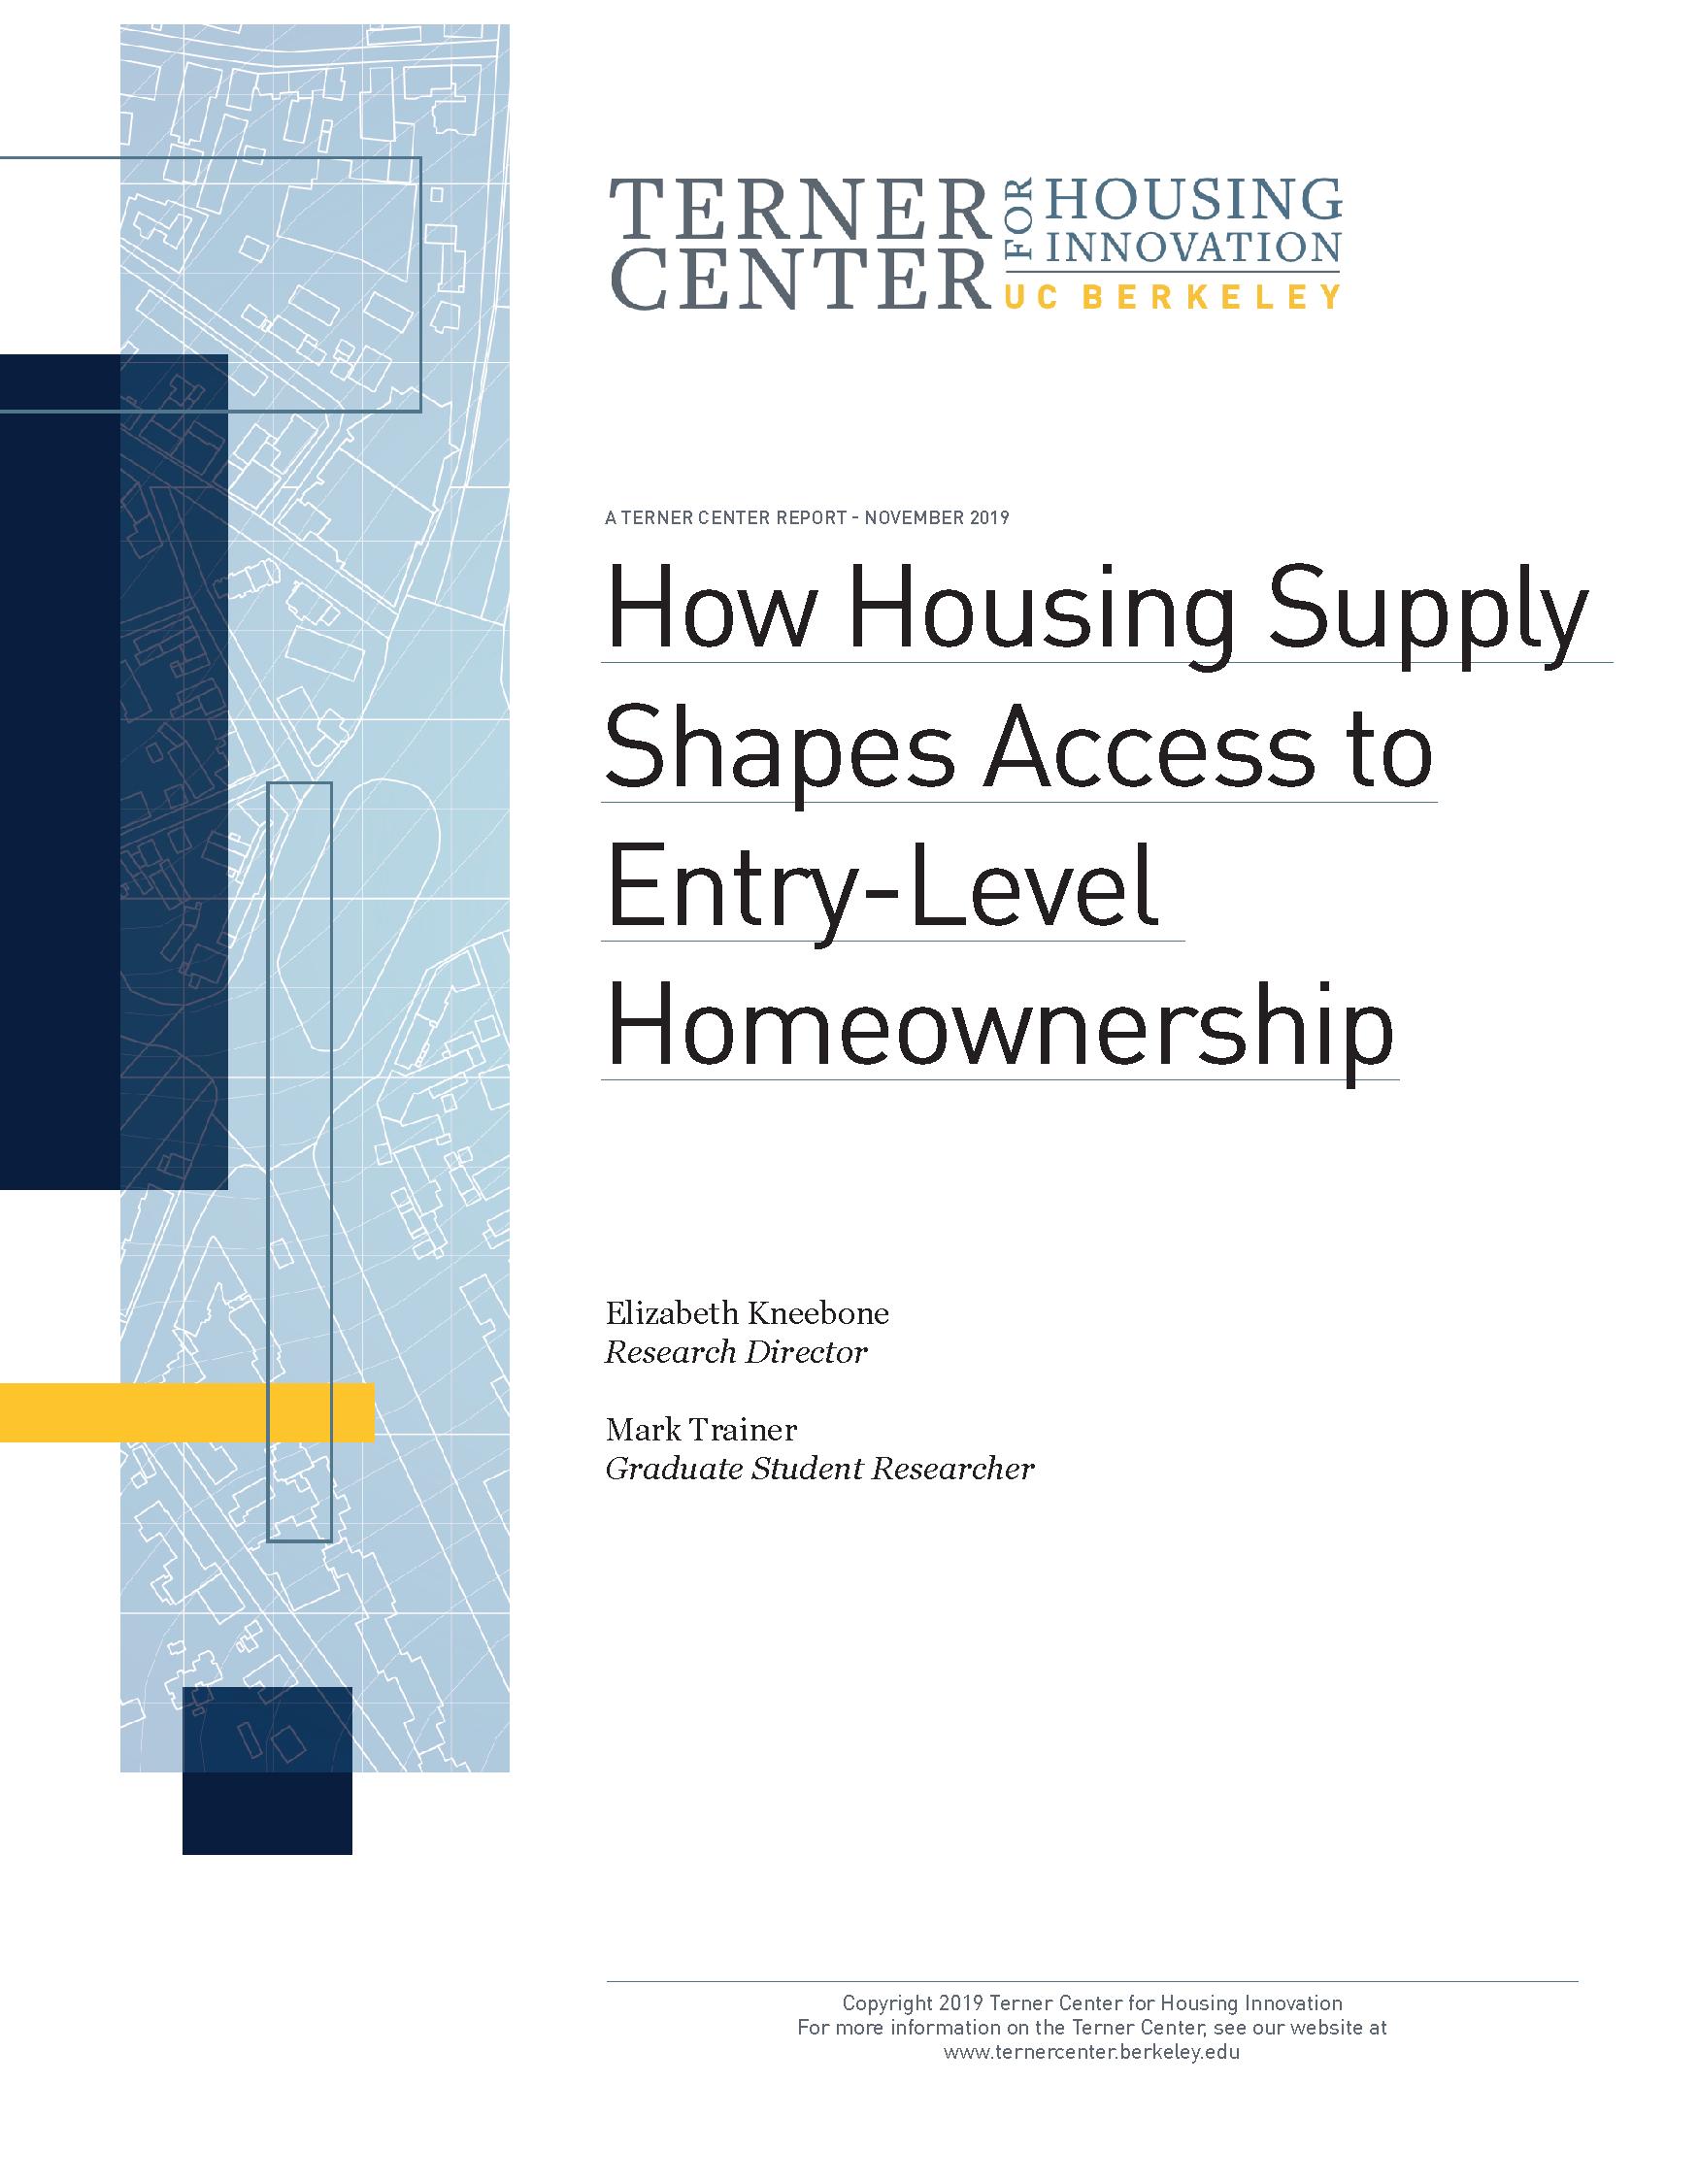 Supply and Access Homeownership PDF